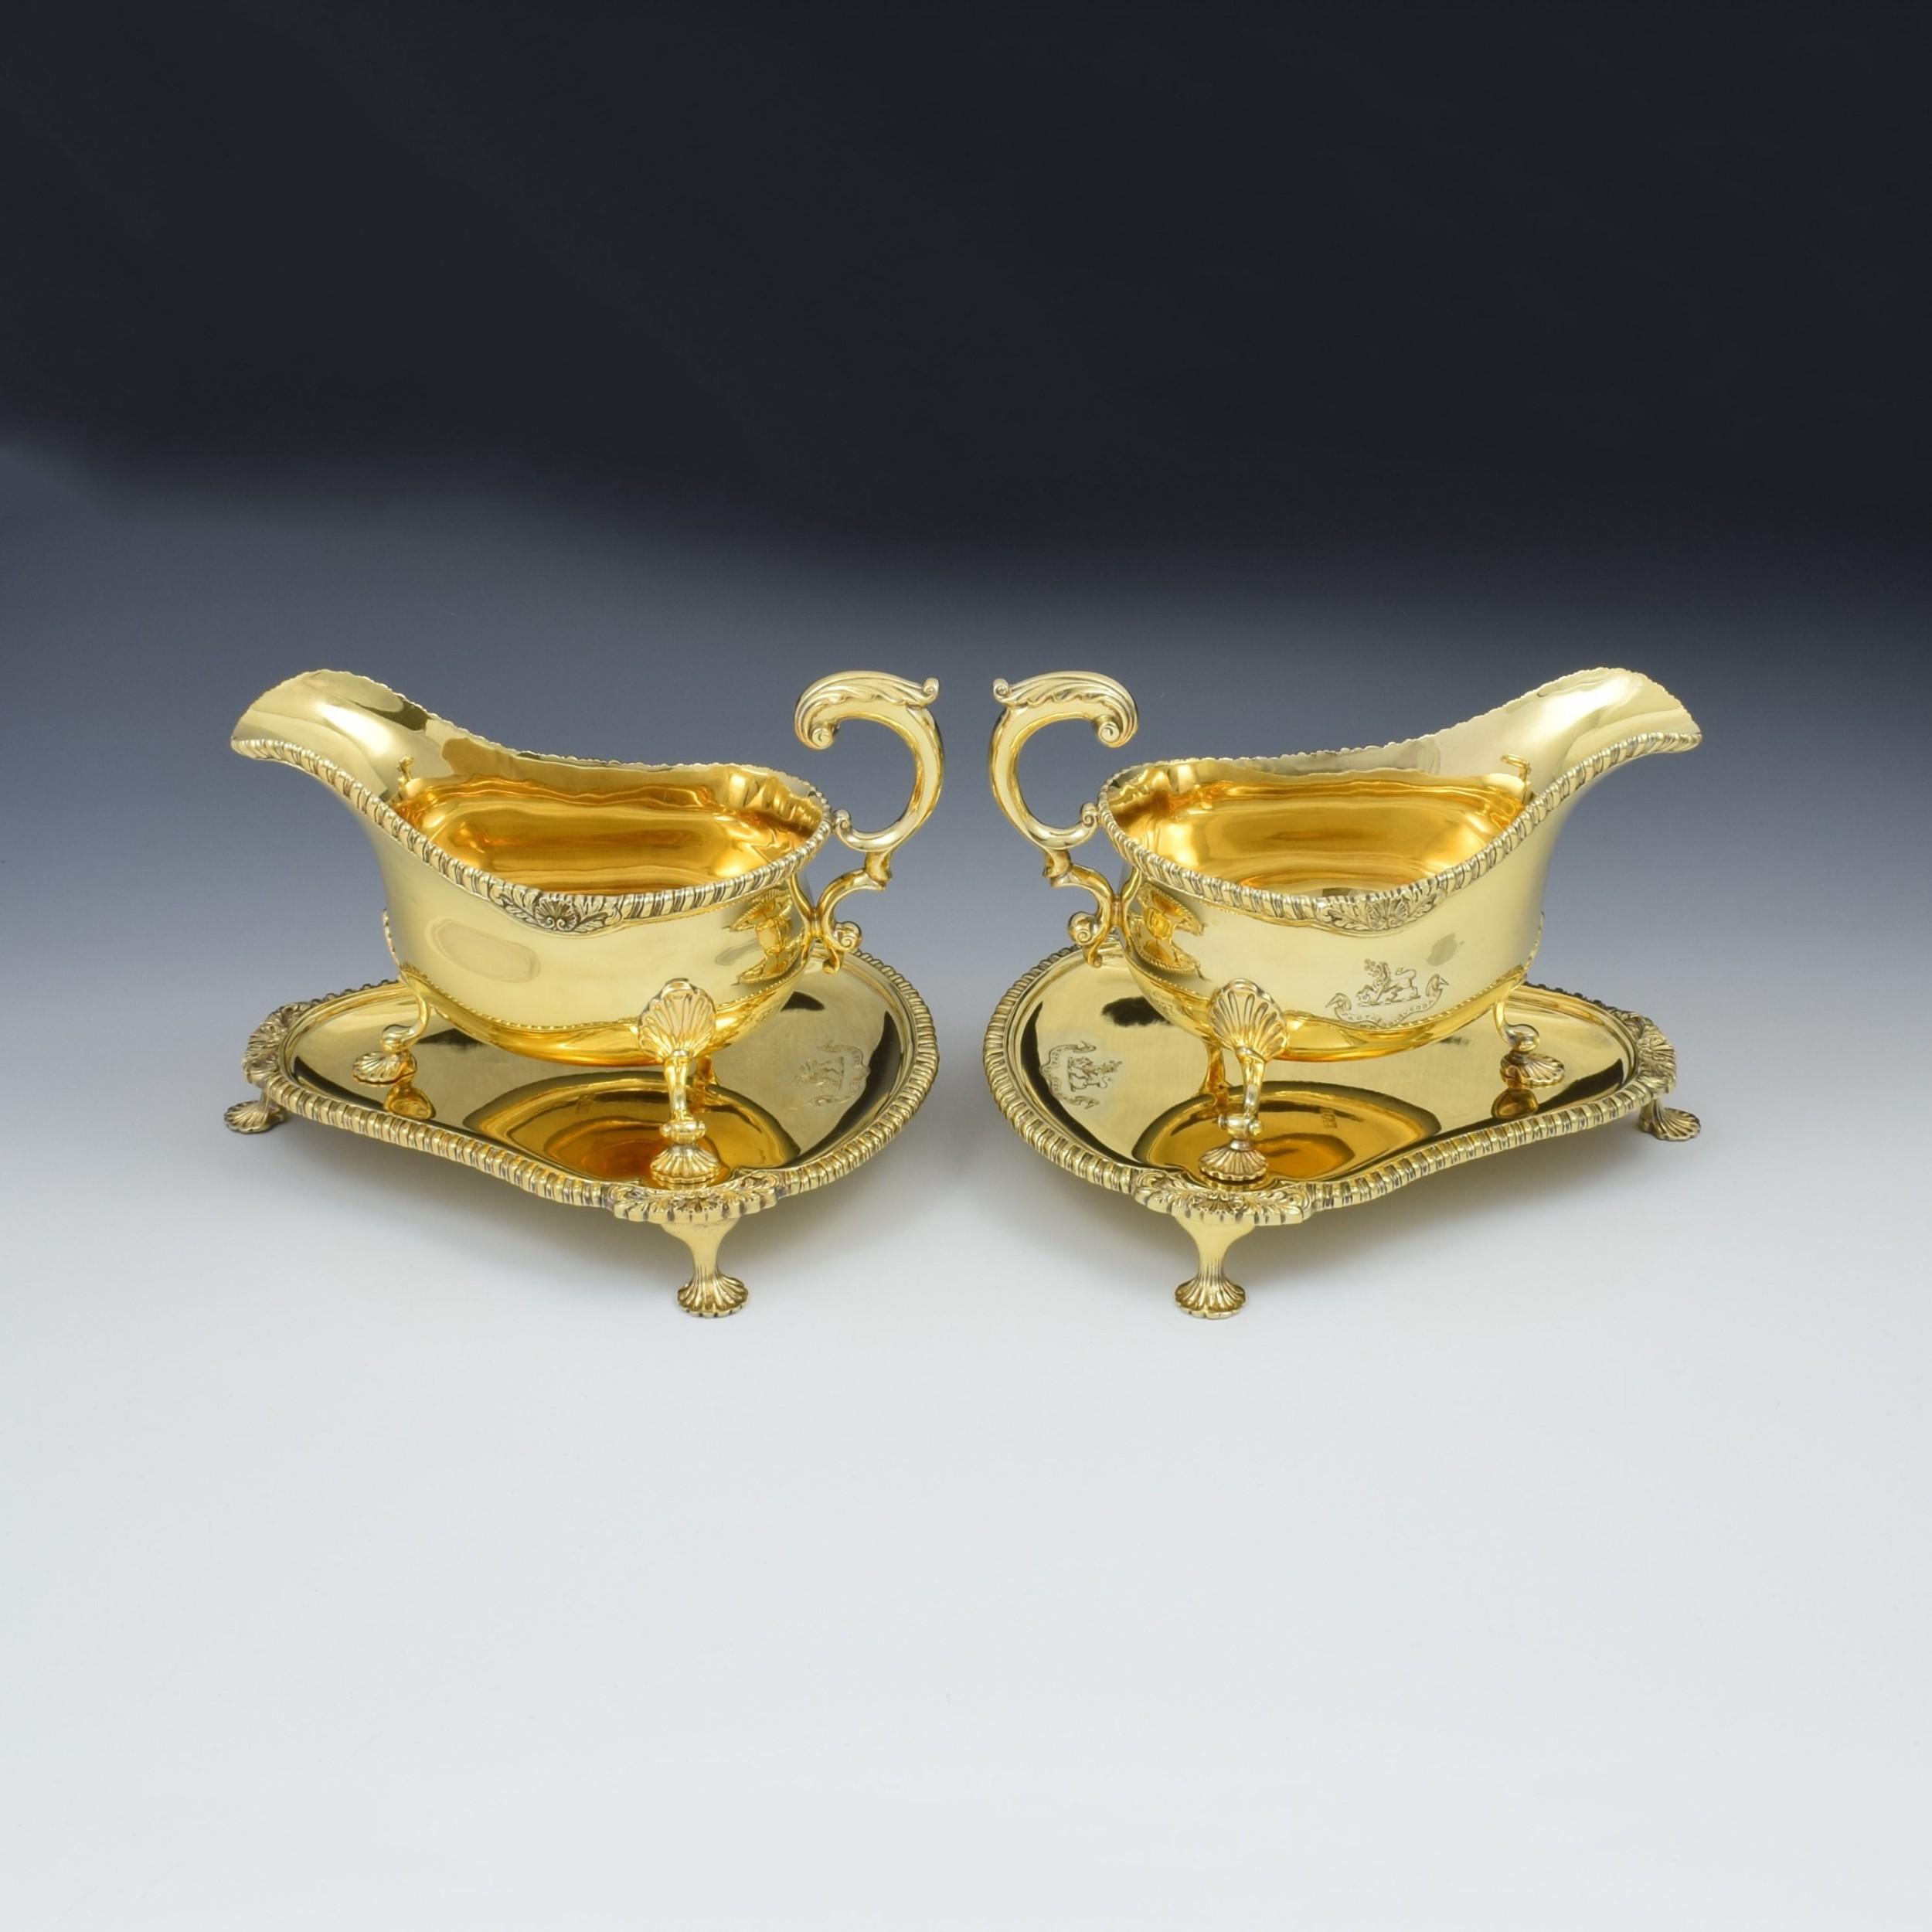 fine pair of edwardian silver gilt sauce boats